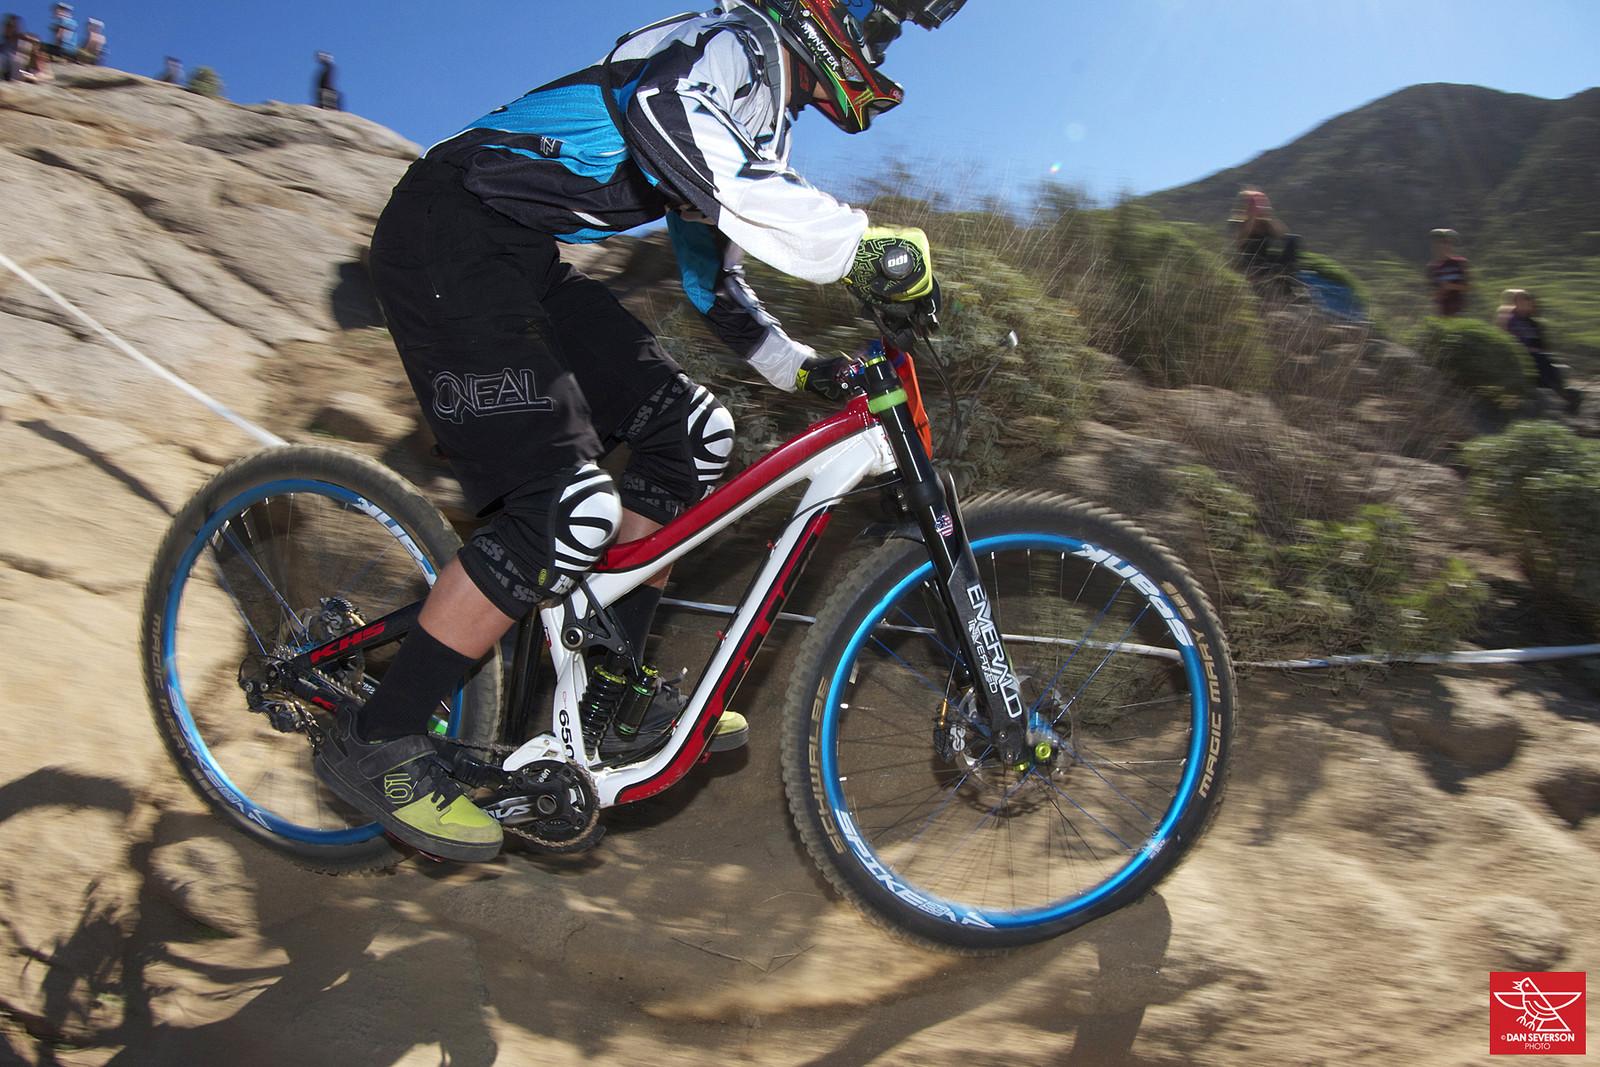 G-Out Project: Fontana 2015 - KHS DH650 - danseverson photo - Mountain Biking Pictures - Vital MTB